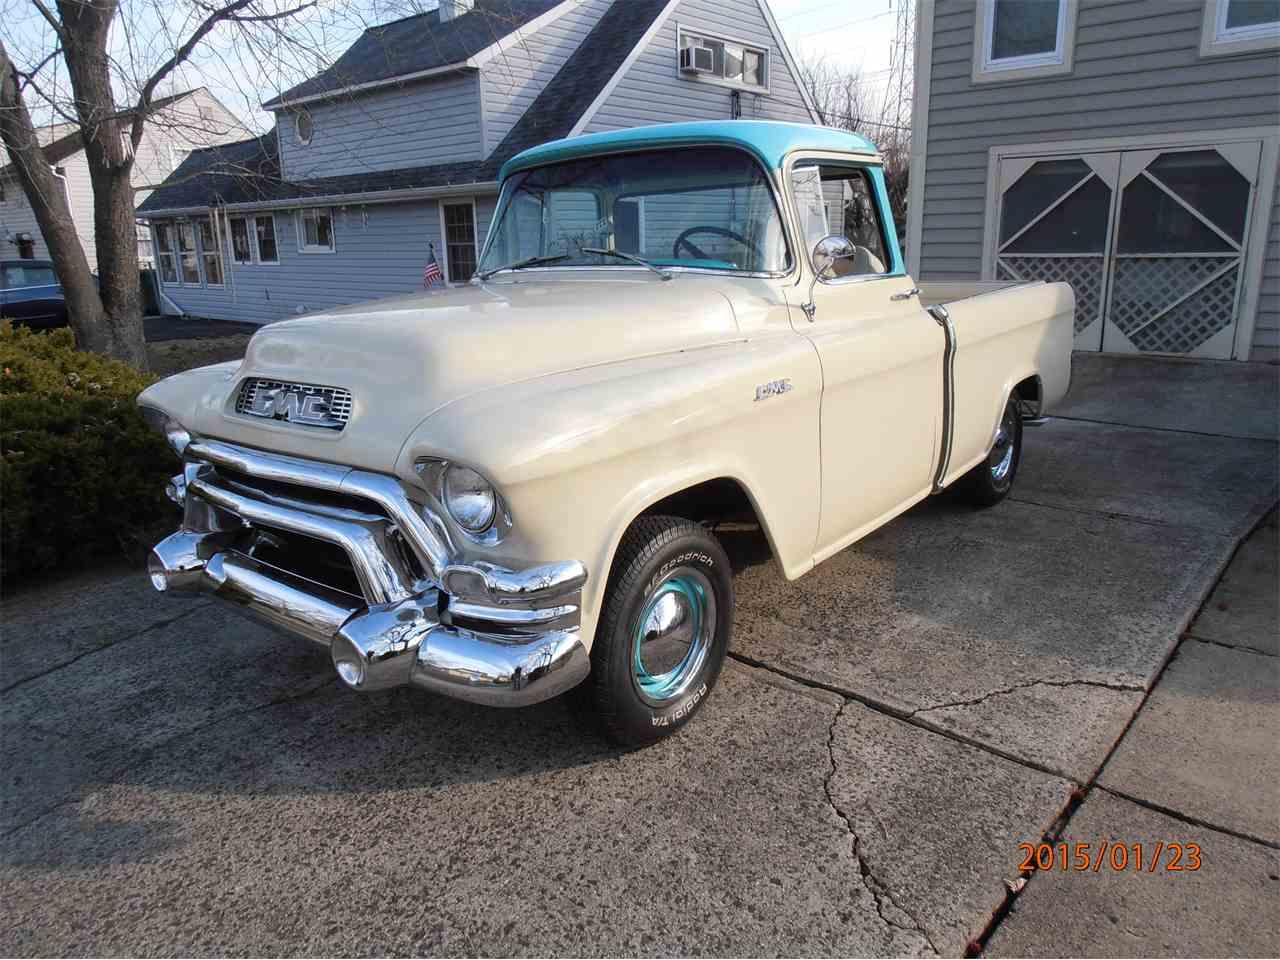 1955 GMC Truck for Sale | ClassicCars.com | CC-940601